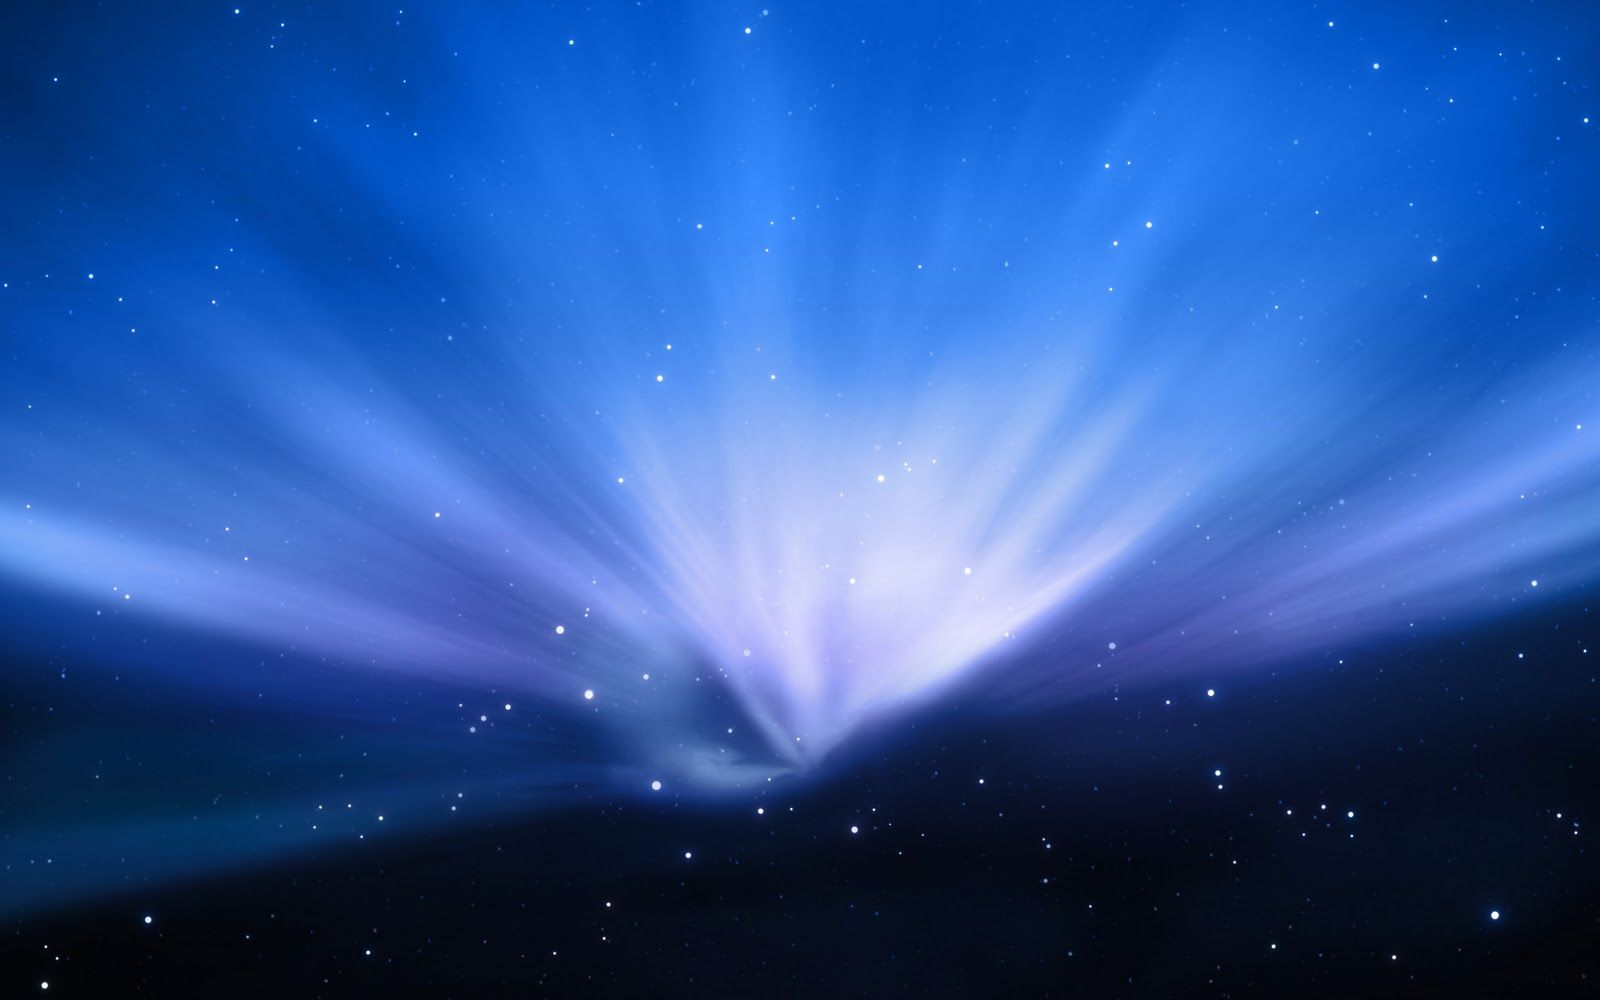 Real Dark Shades Of Blue Blauwe Arora Achtergrond Beautiful Blue